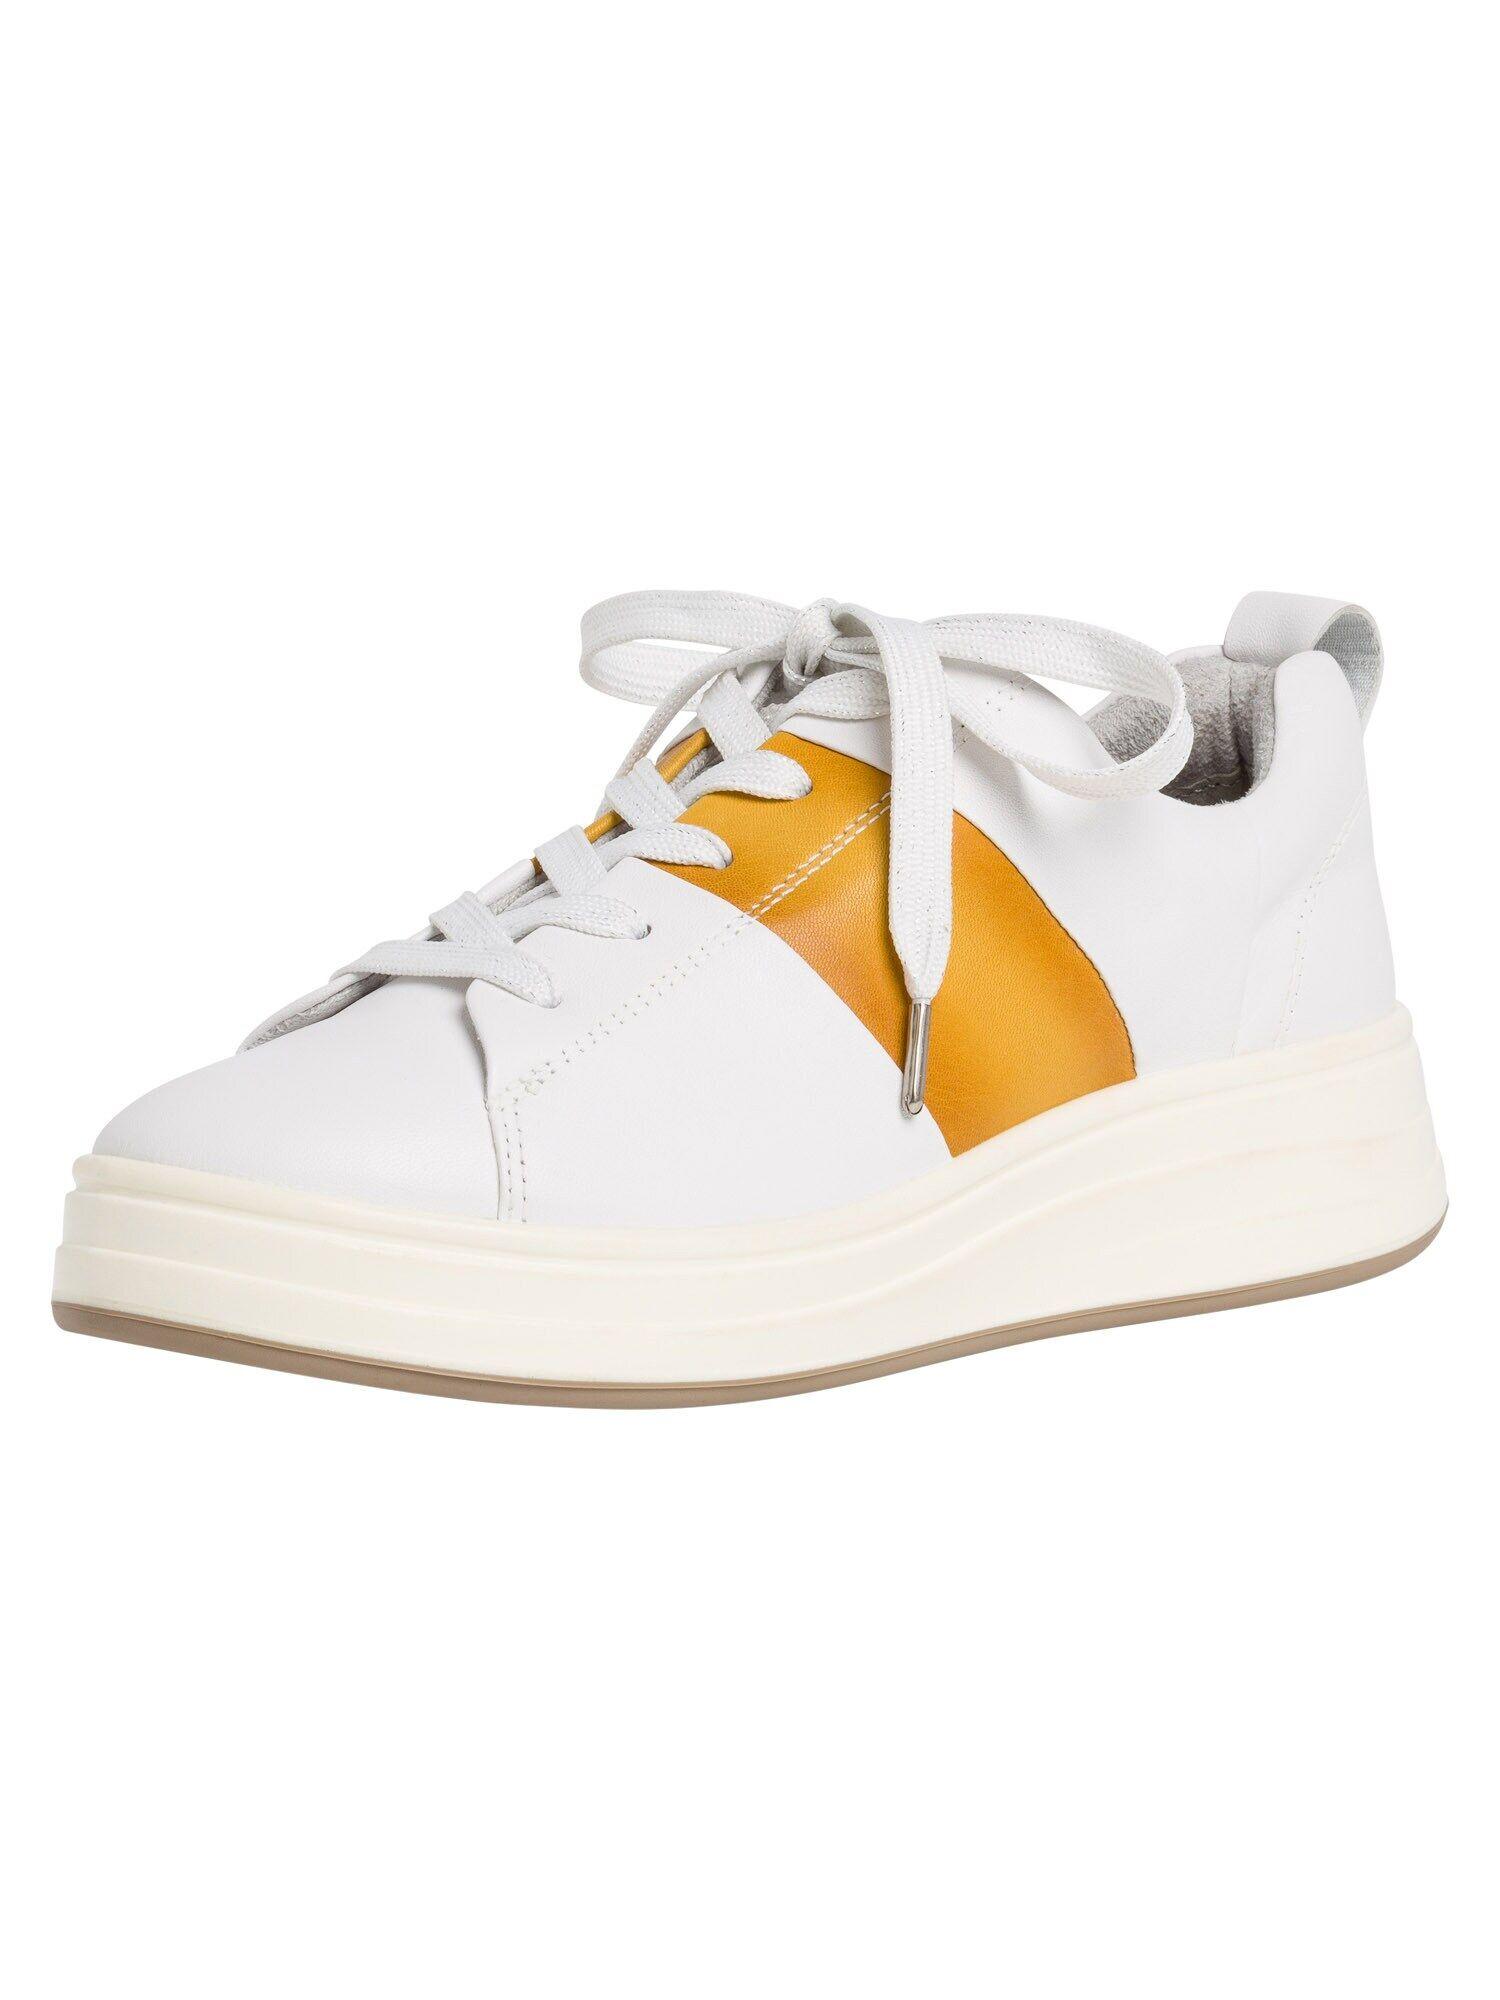 TAMARIS Baskets basses  - Blanc, Jaune - Taille: 39 - female